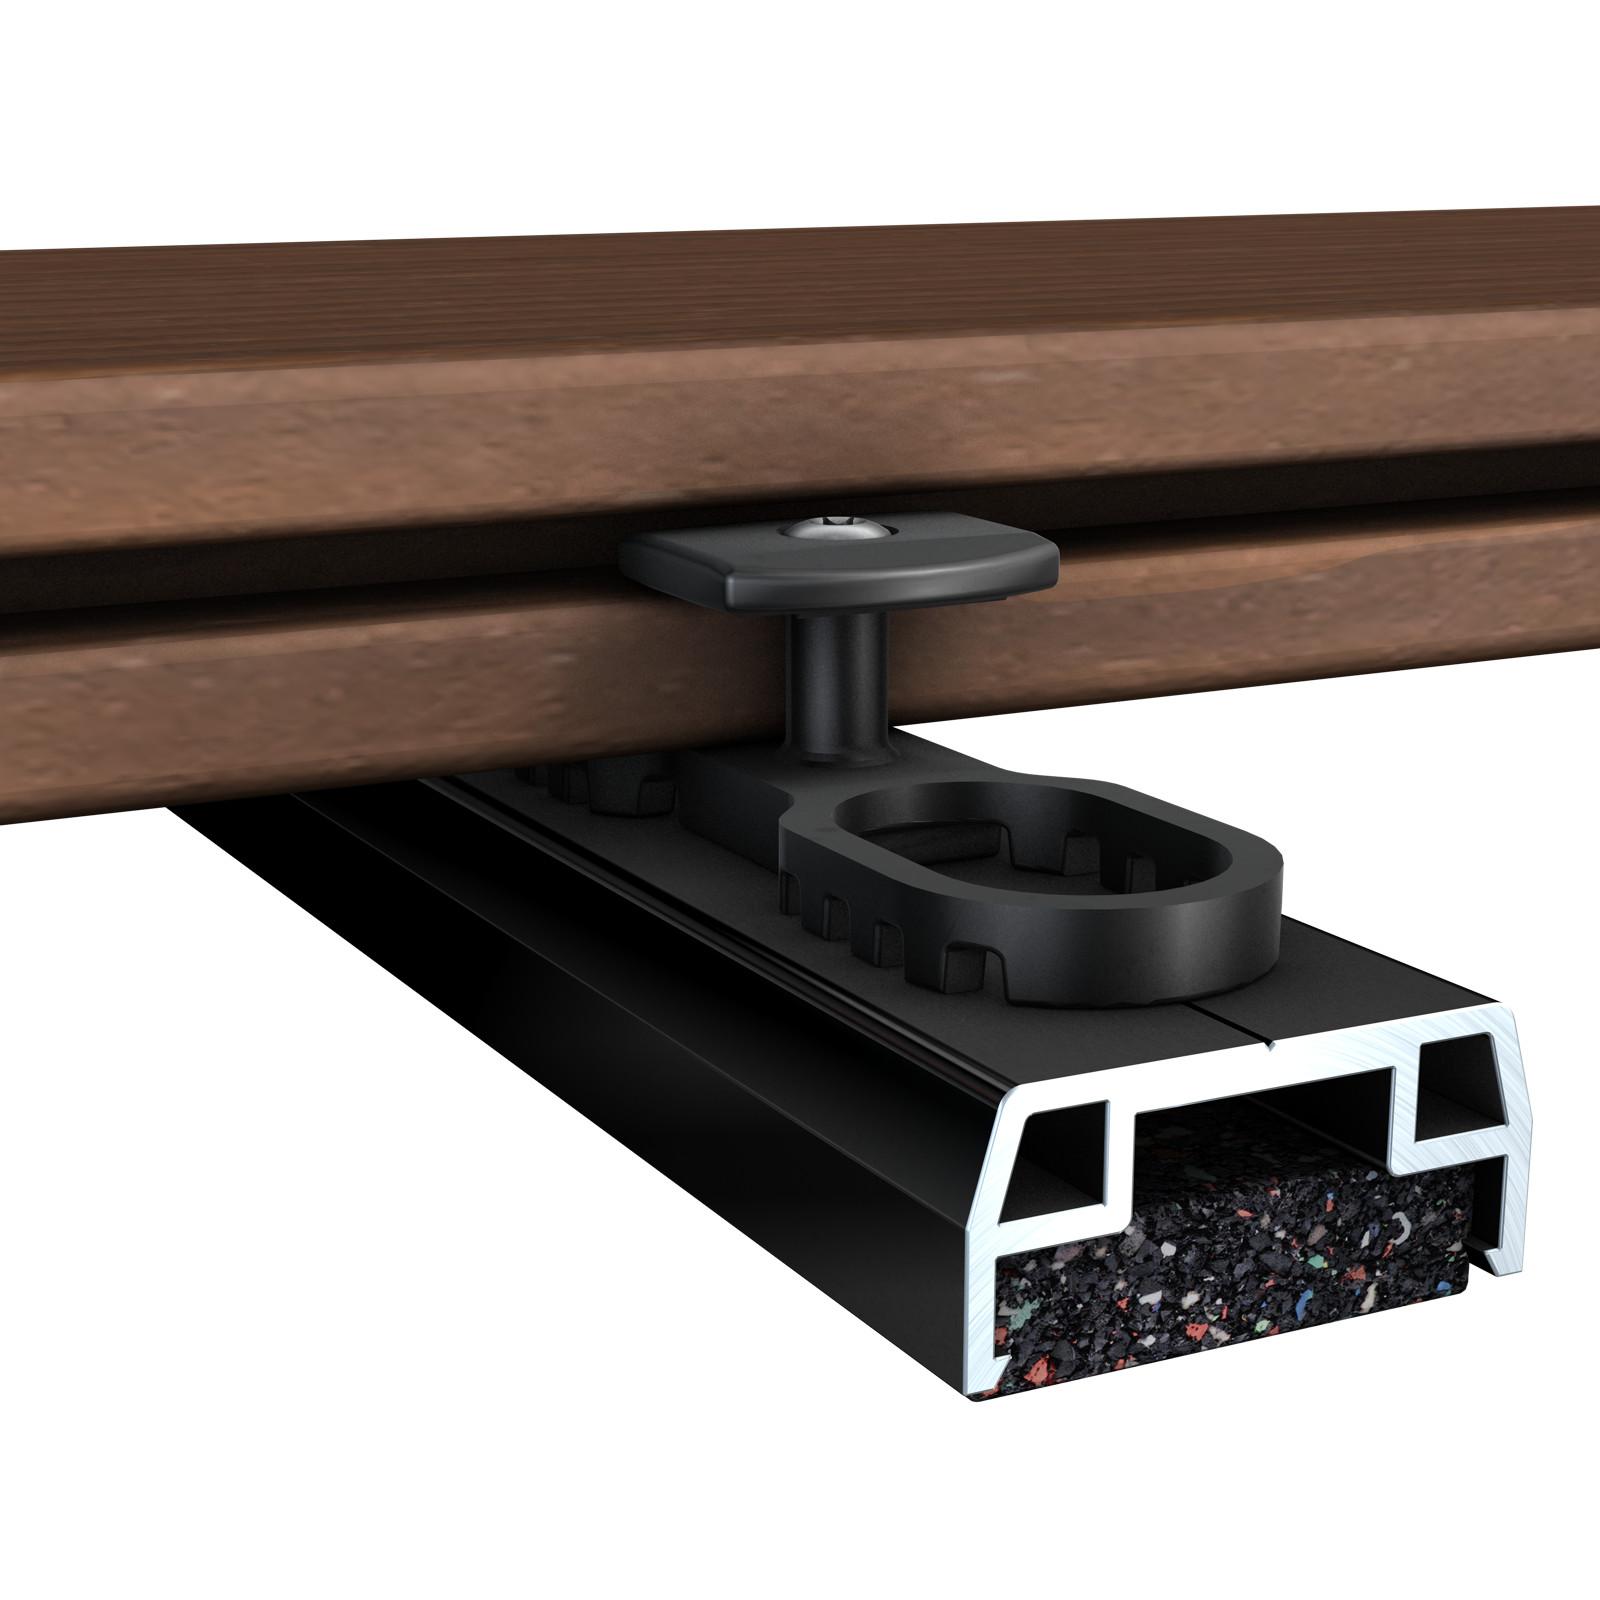 alu unterkonstruktion isostep alu unterkonstruktion terrassenzubeh r terrasse garten. Black Bedroom Furniture Sets. Home Design Ideas